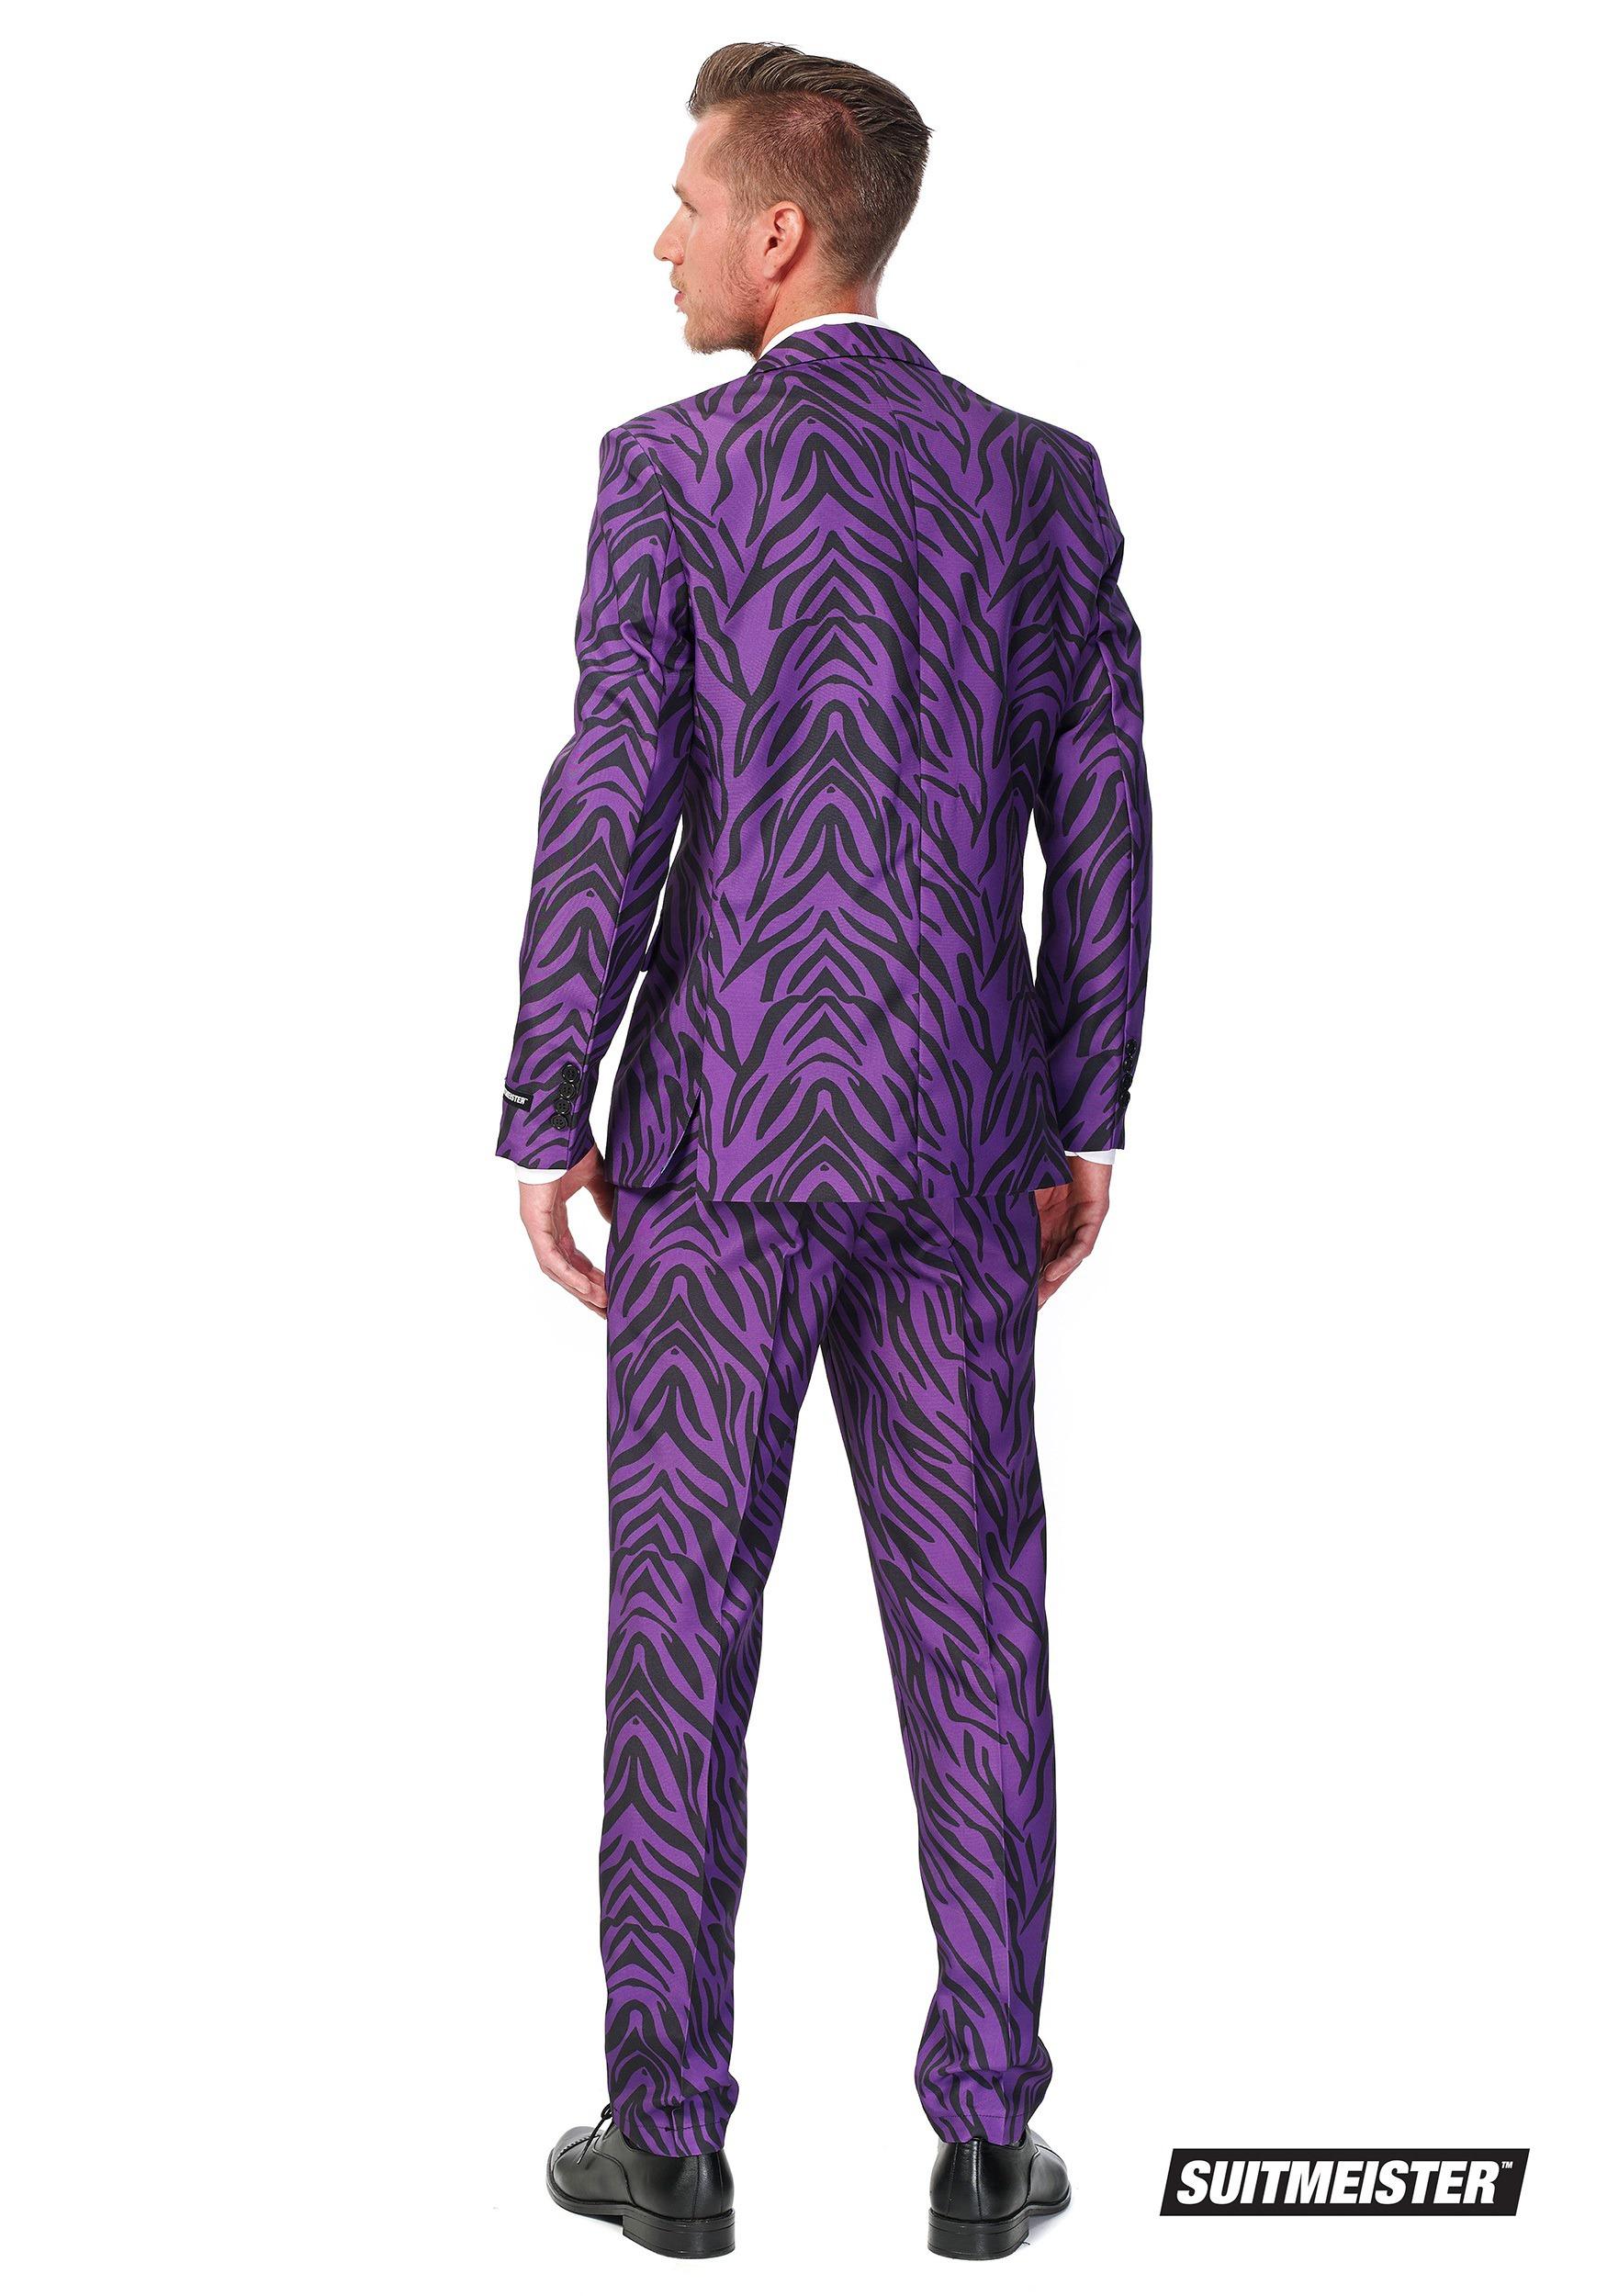 Suitmeister Basic Pimp Tiger Suit Costume For Men